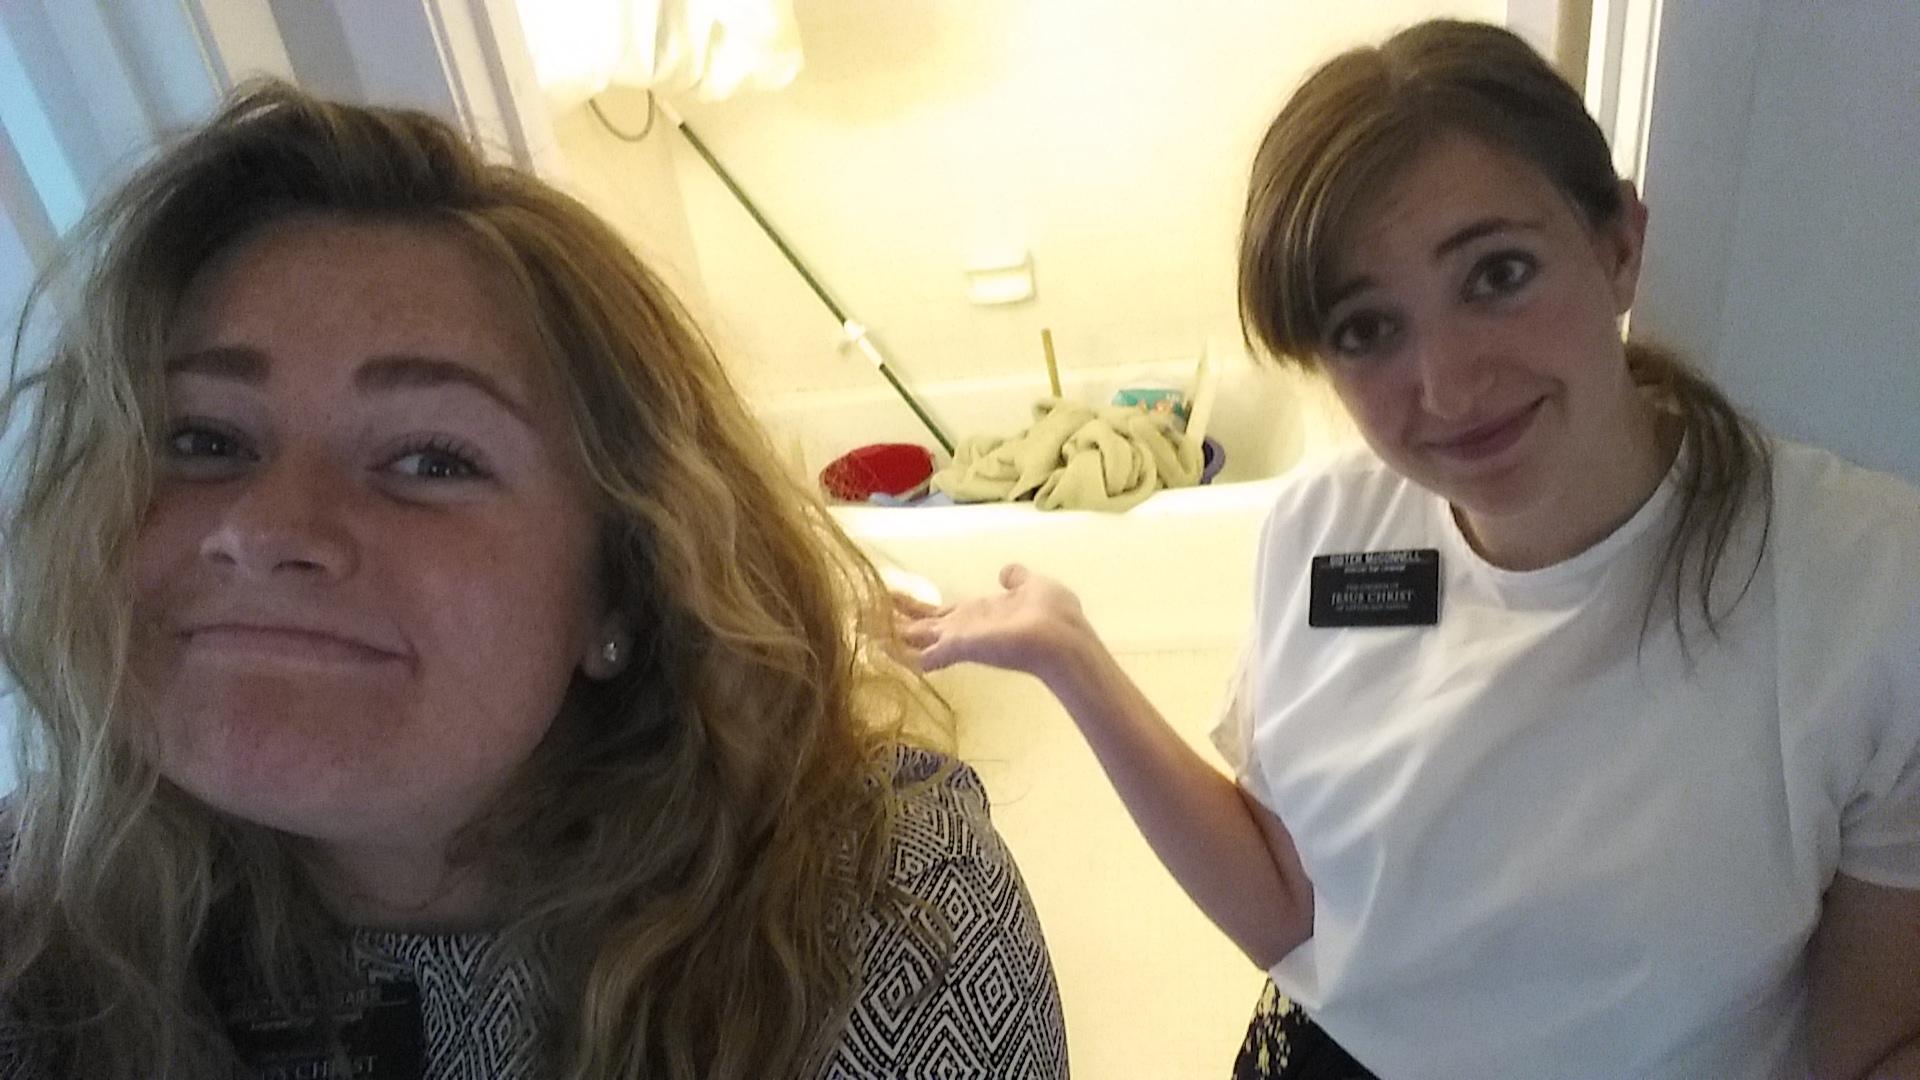 Our broken bathroom. What do ya do?